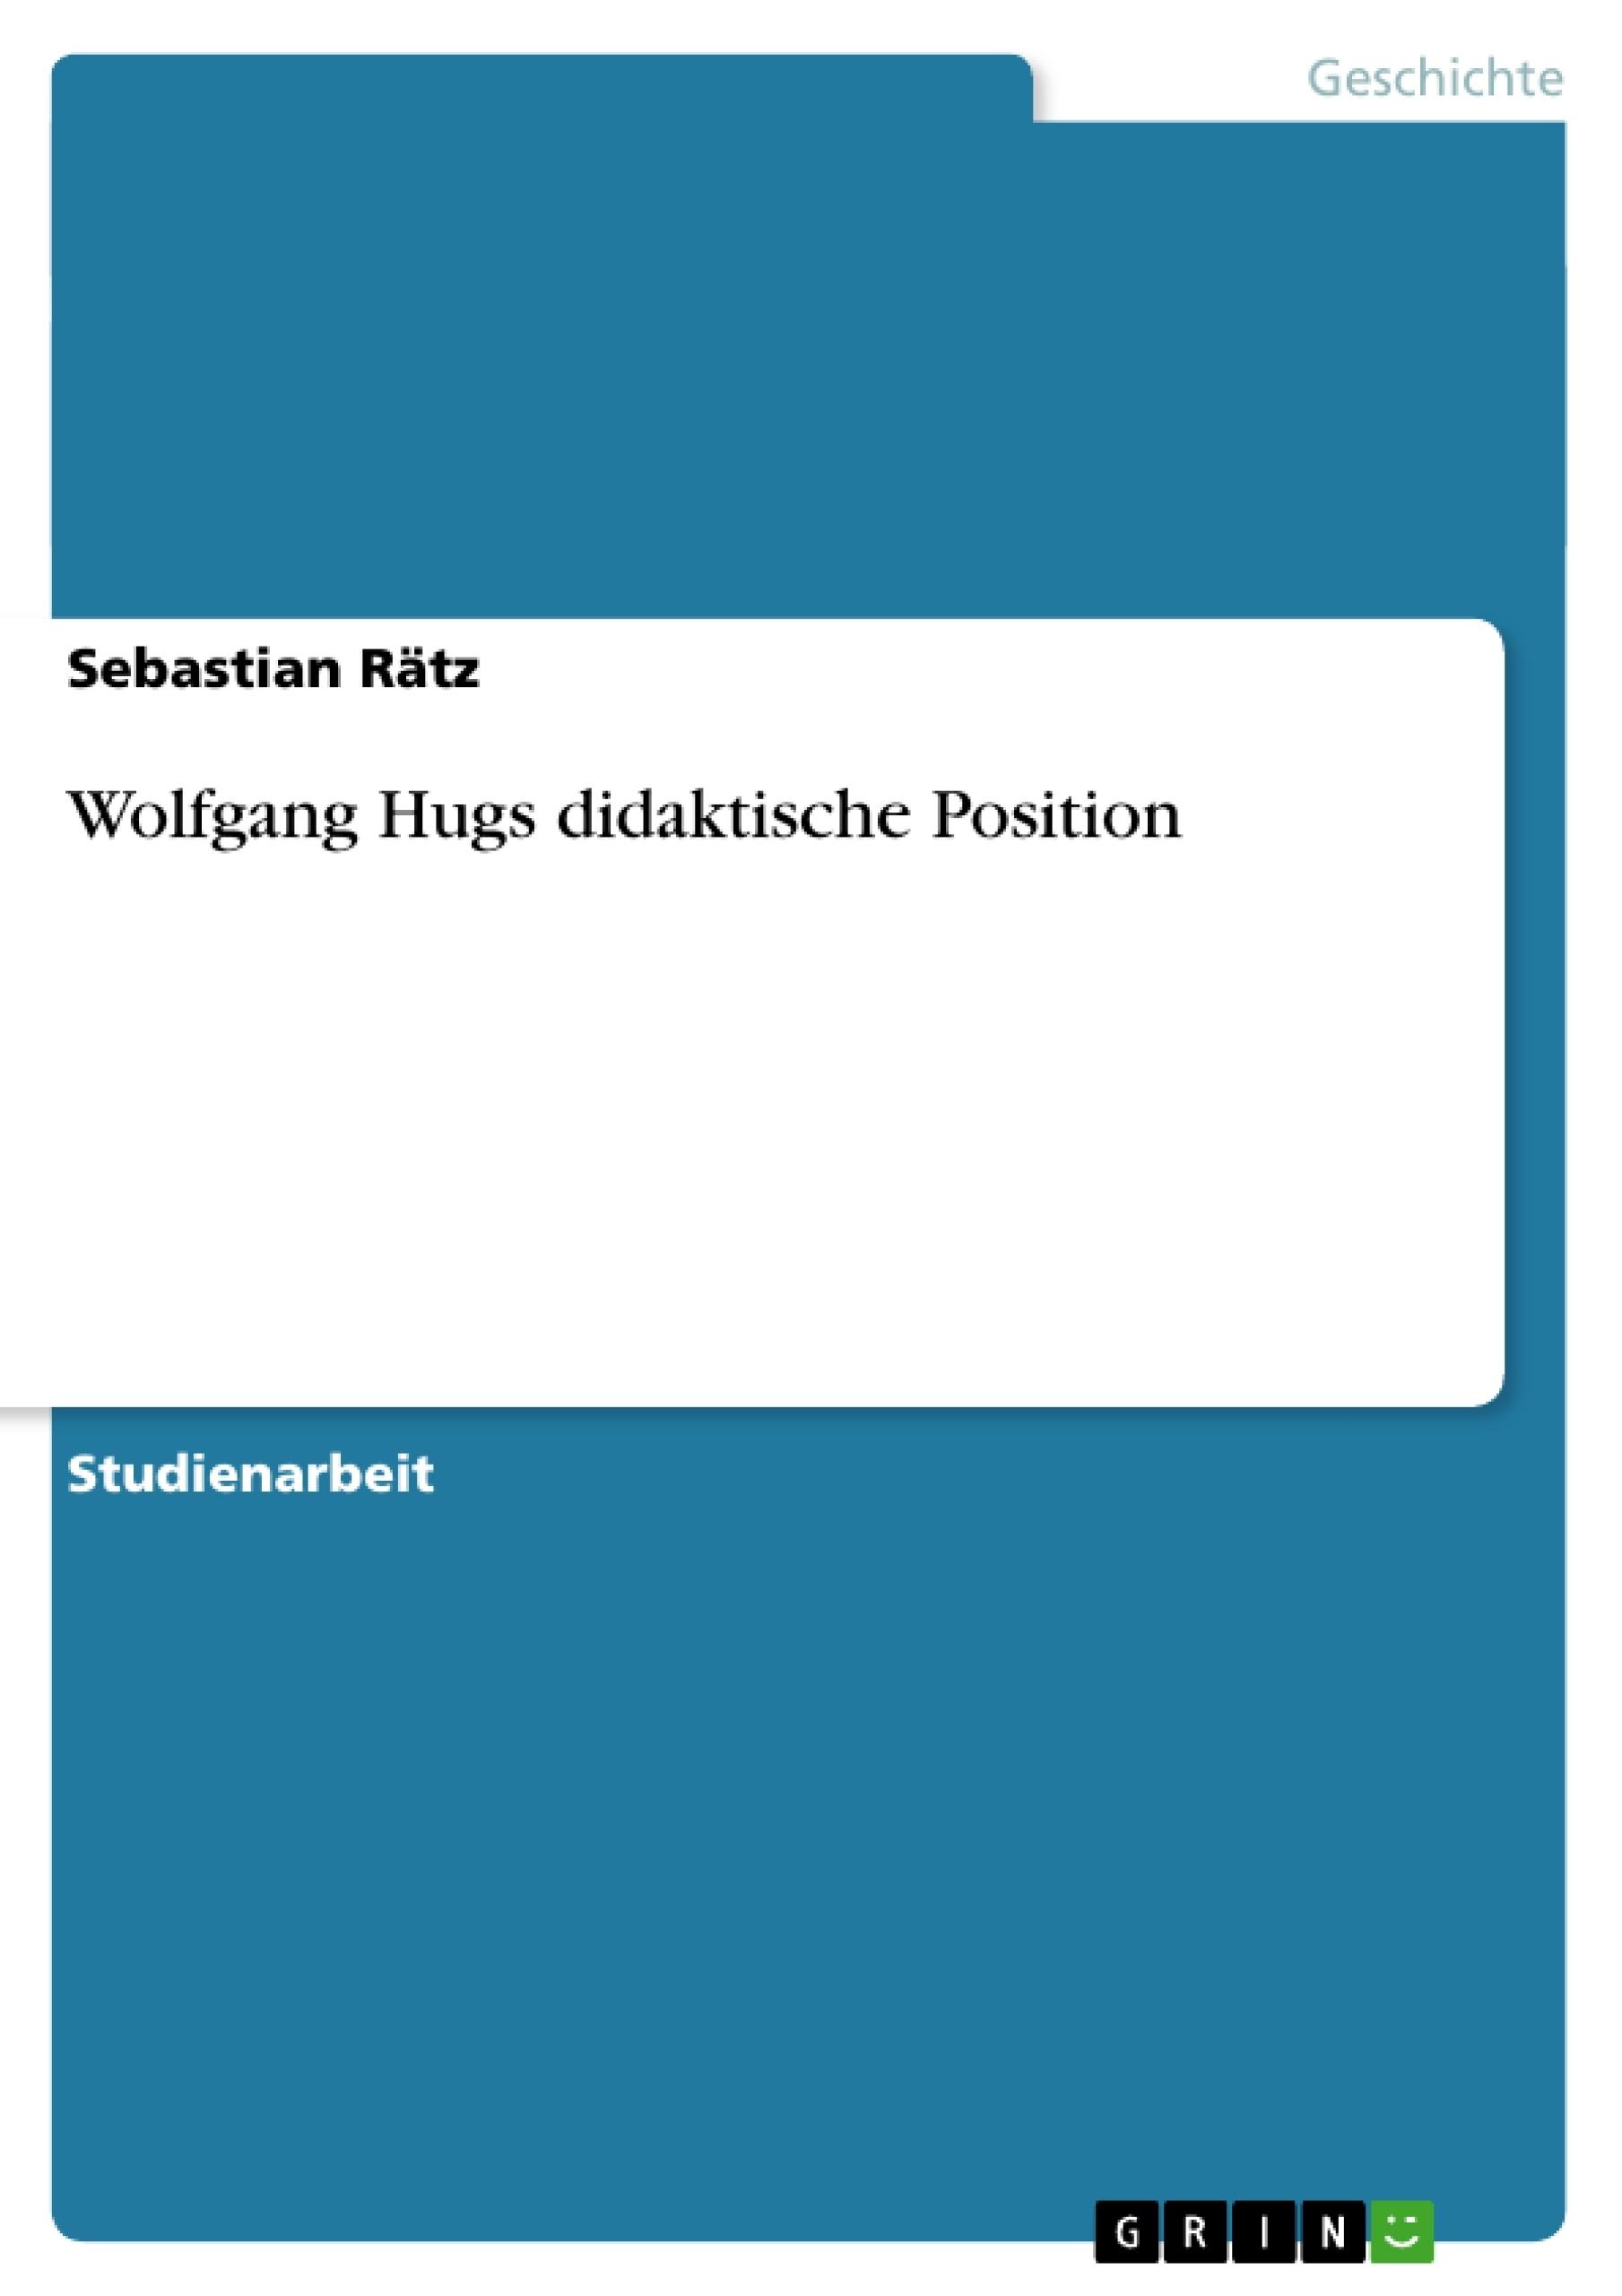 Titel: Wolfgang Hugs didaktische Position